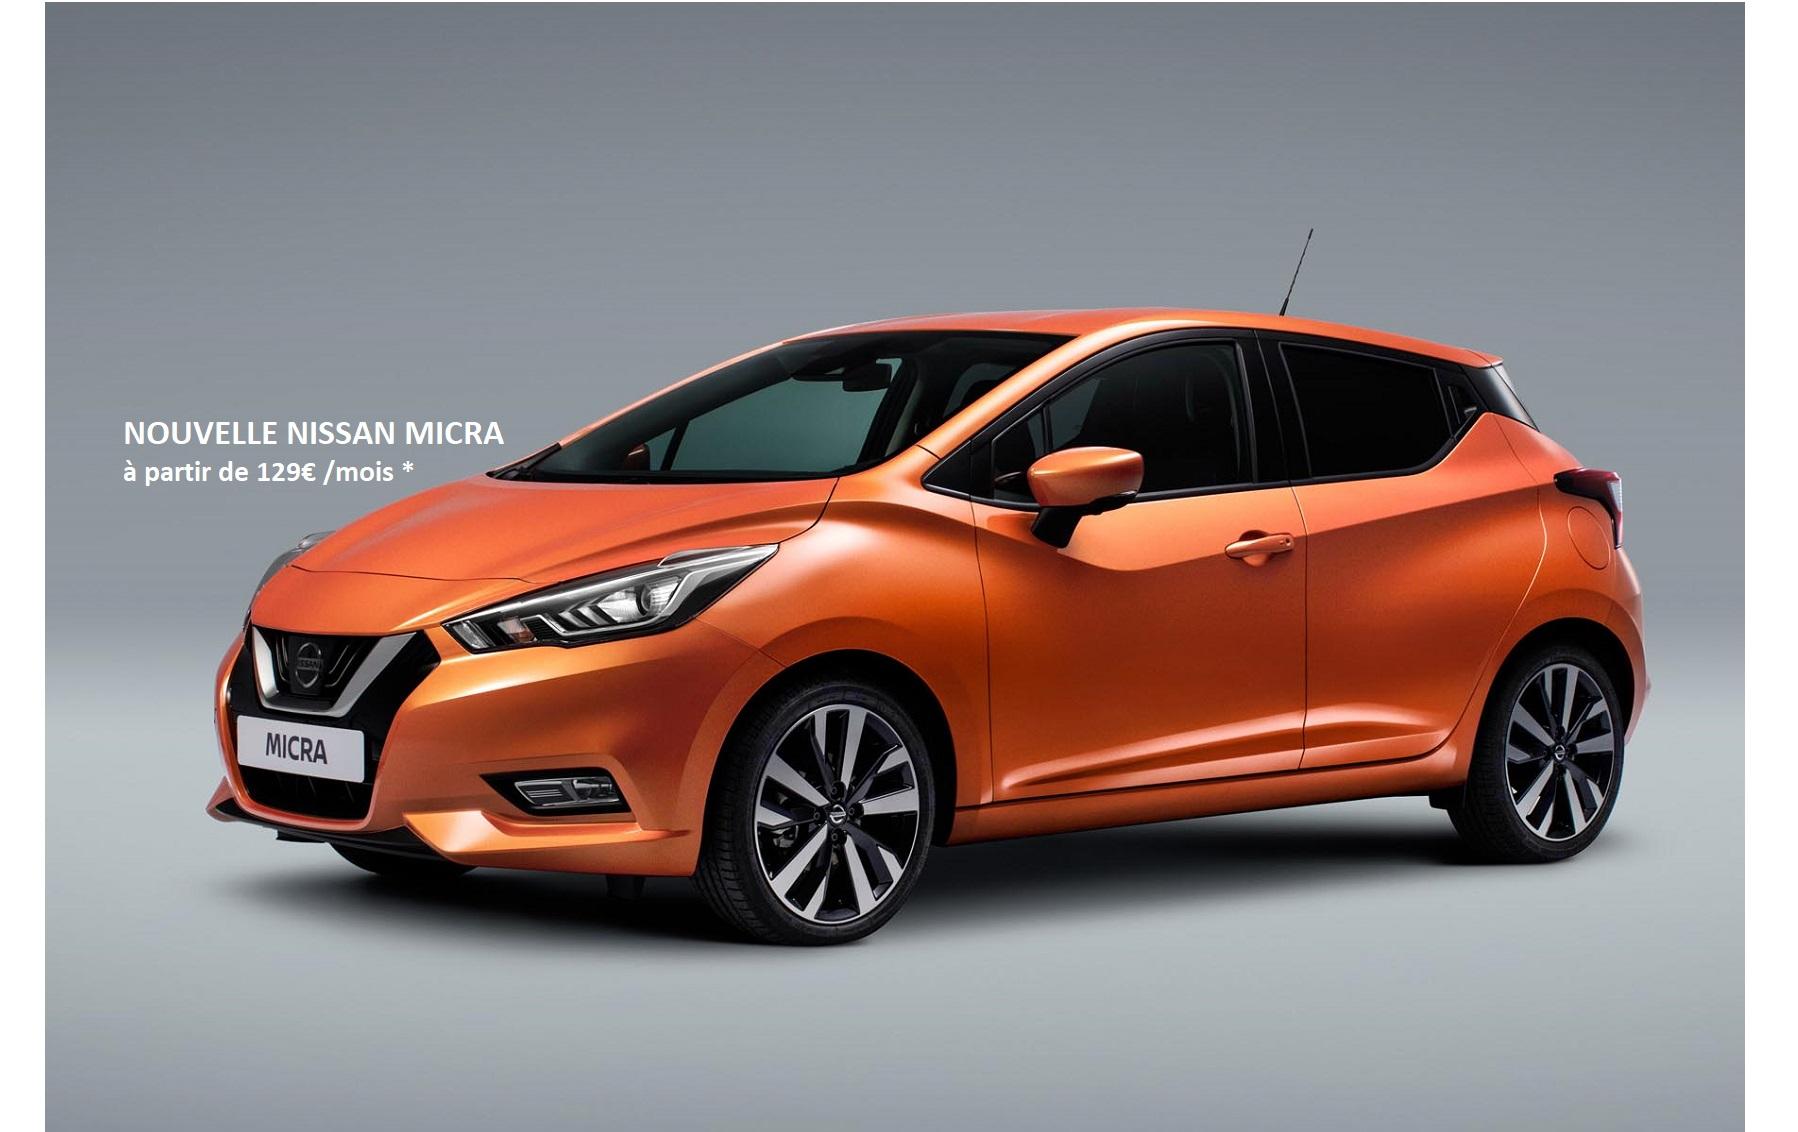 Nissan_Micra_2016_146bd-raw.jpg